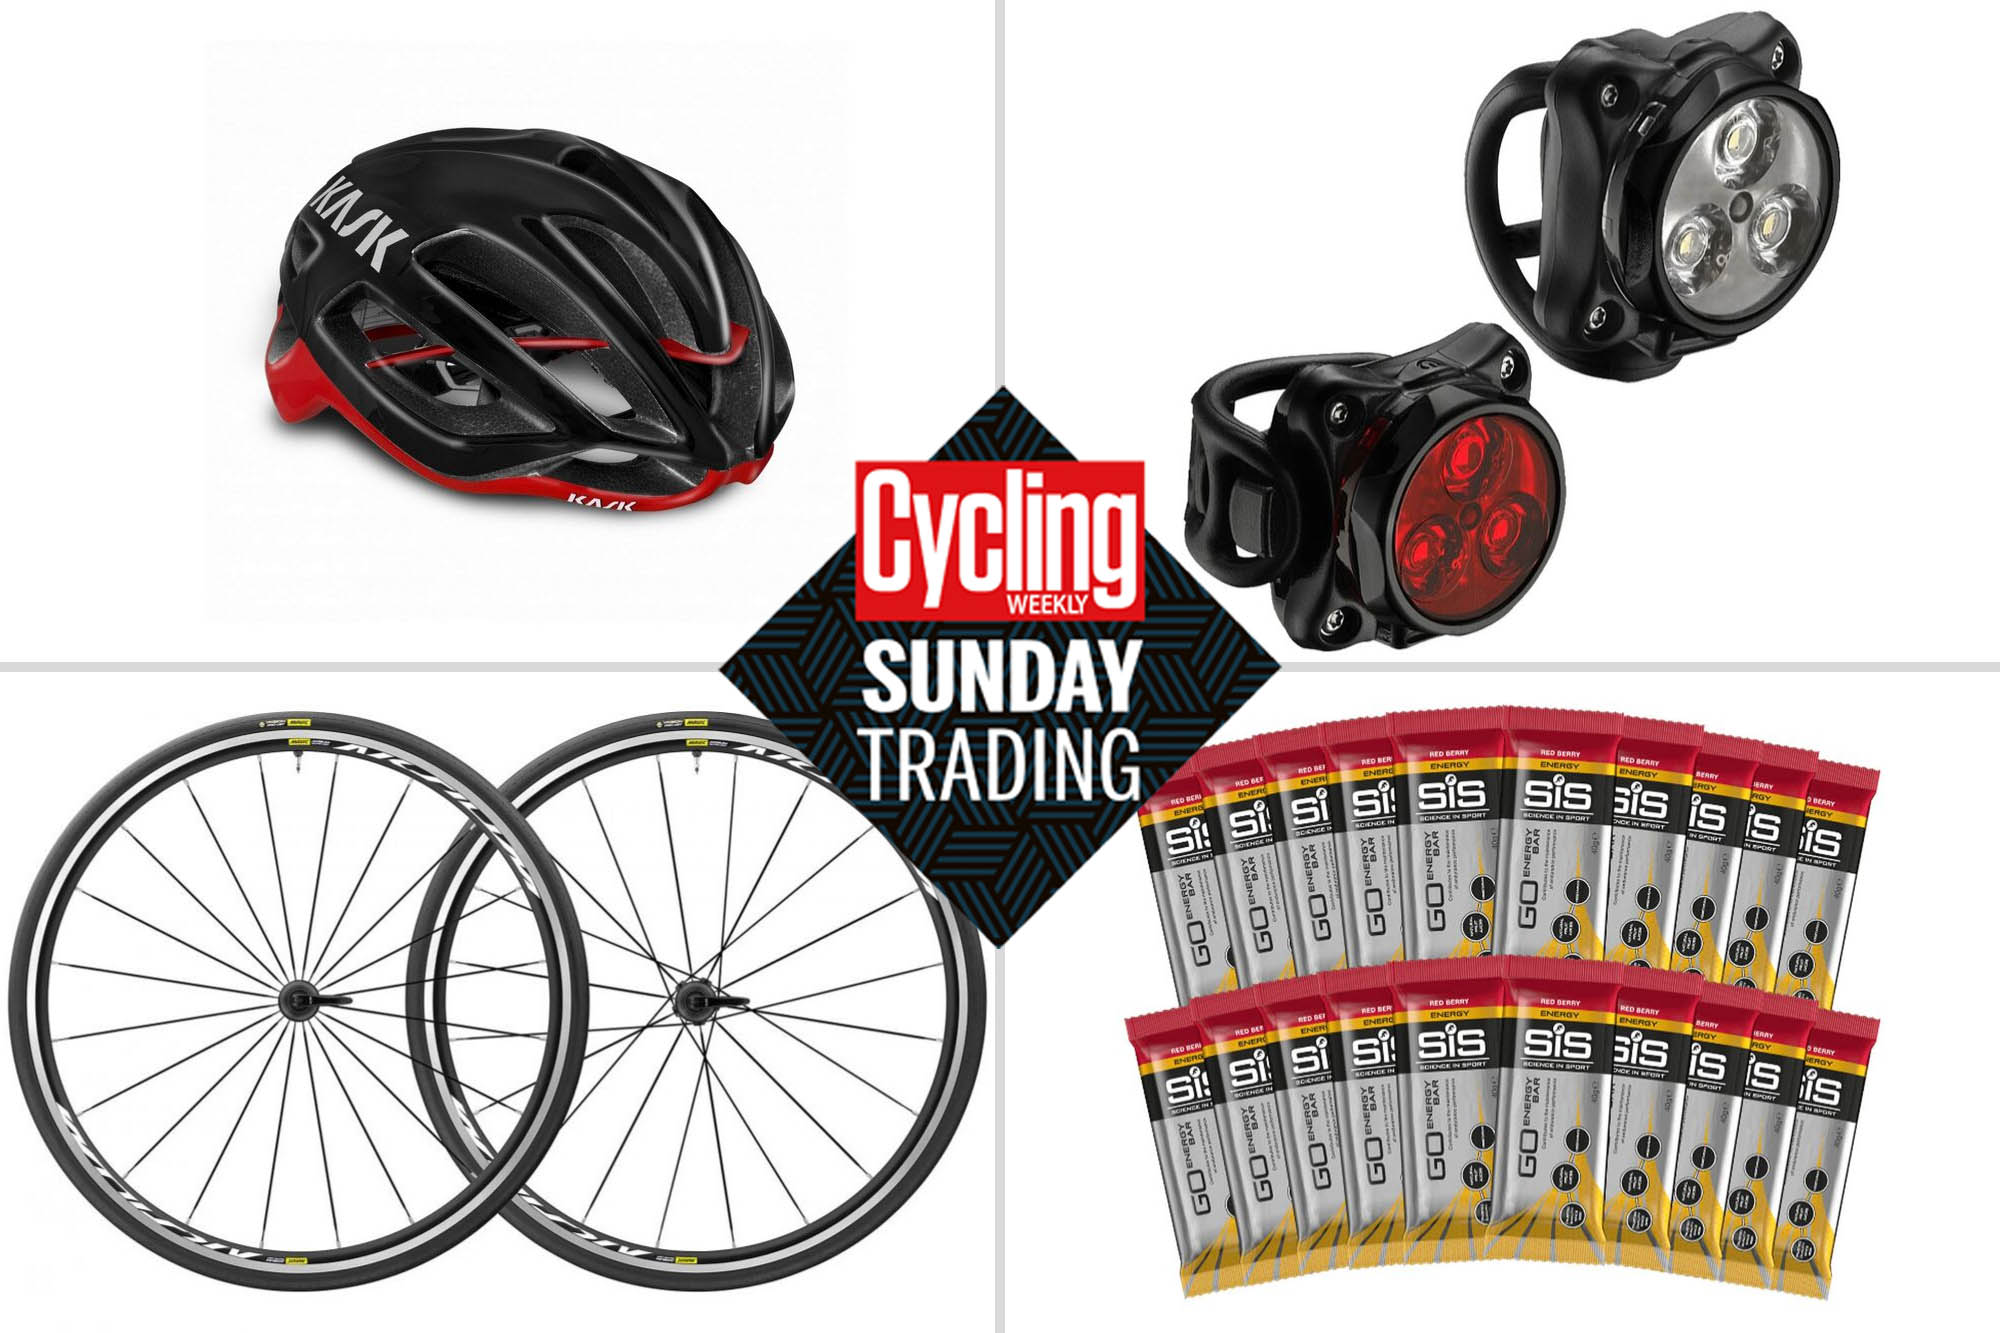 Sunday trading: Big discounts on Mavic wheels, bike lights and SiS nutrition